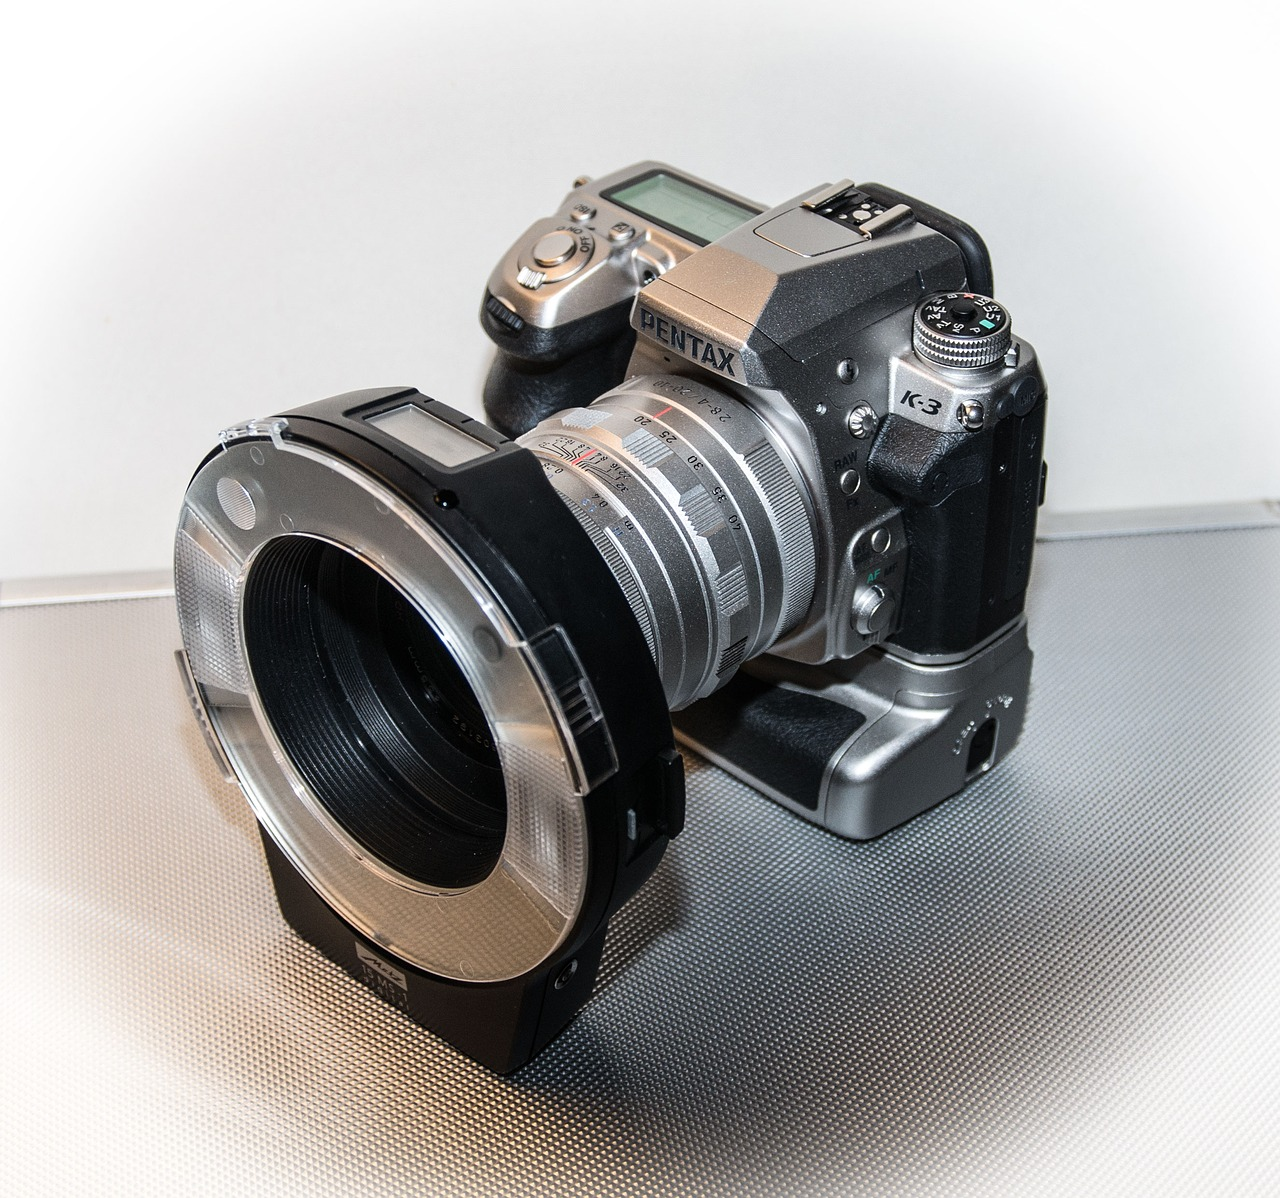 Digitalkamera mit Rundblitz